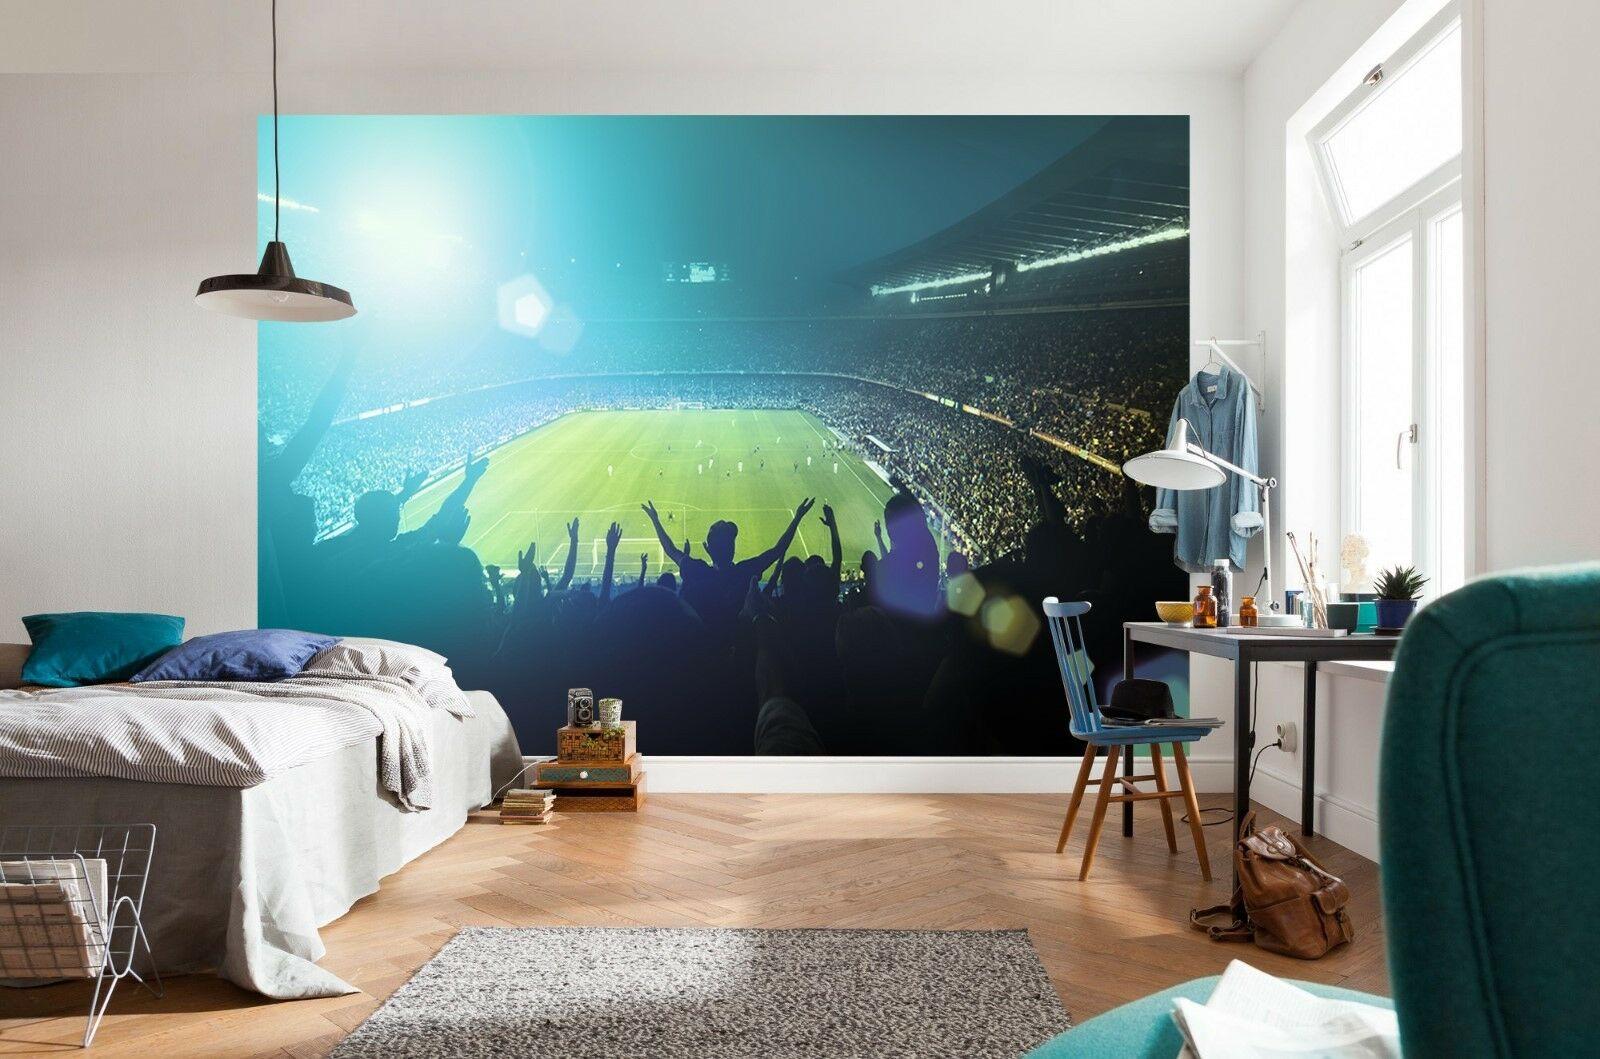 Beach Wall Paper Living Room - HD Wallpaper